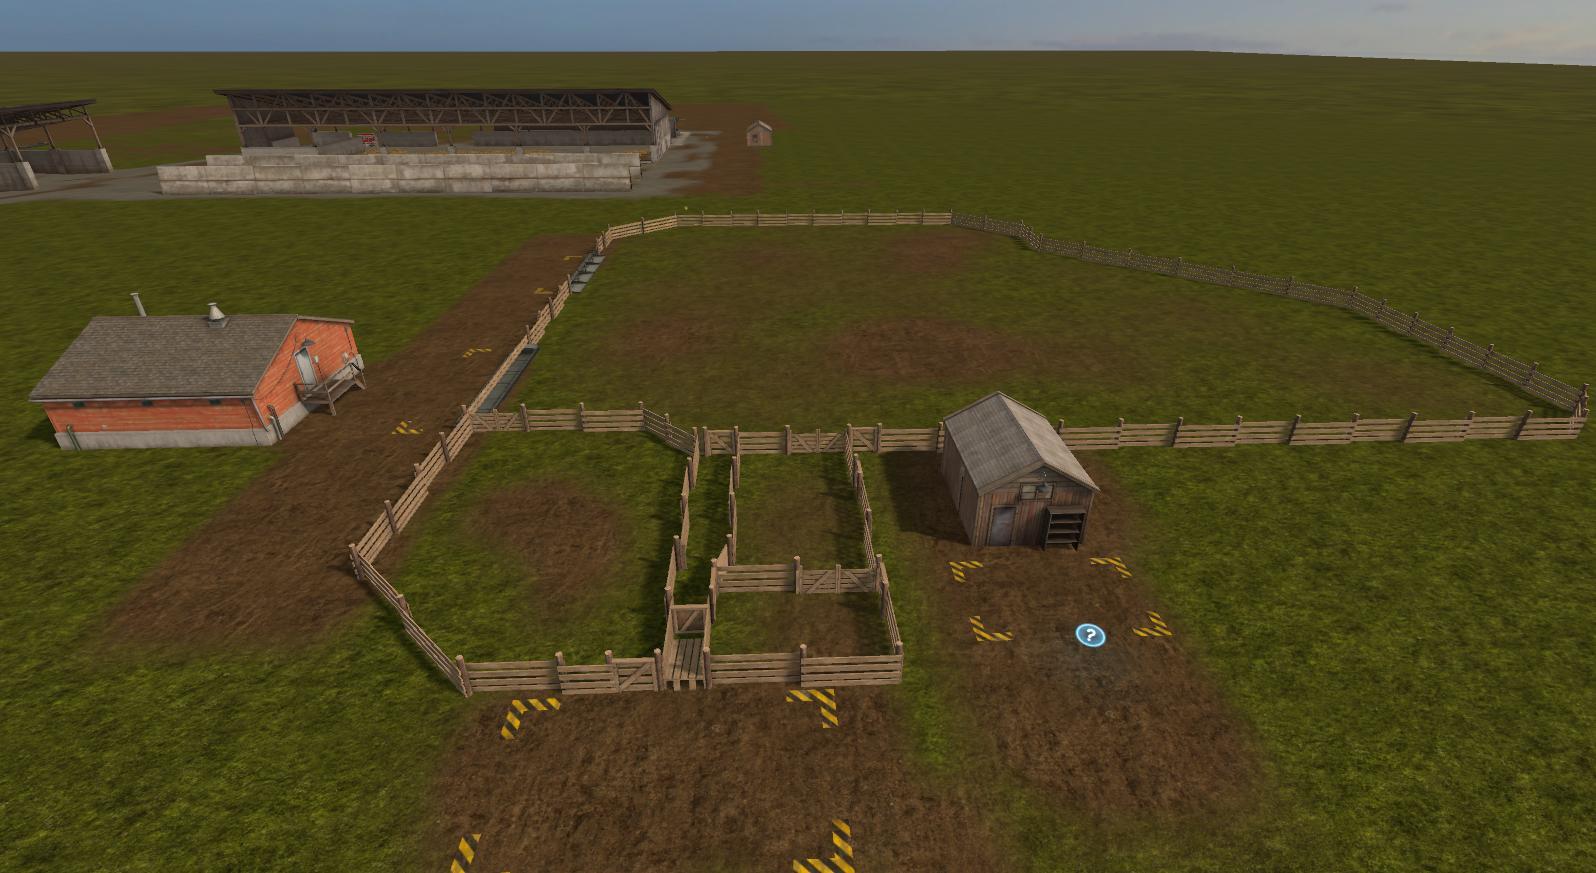 SAMPLE V LS Farming Simulator Mod FS Mod - Us map mod fs 17